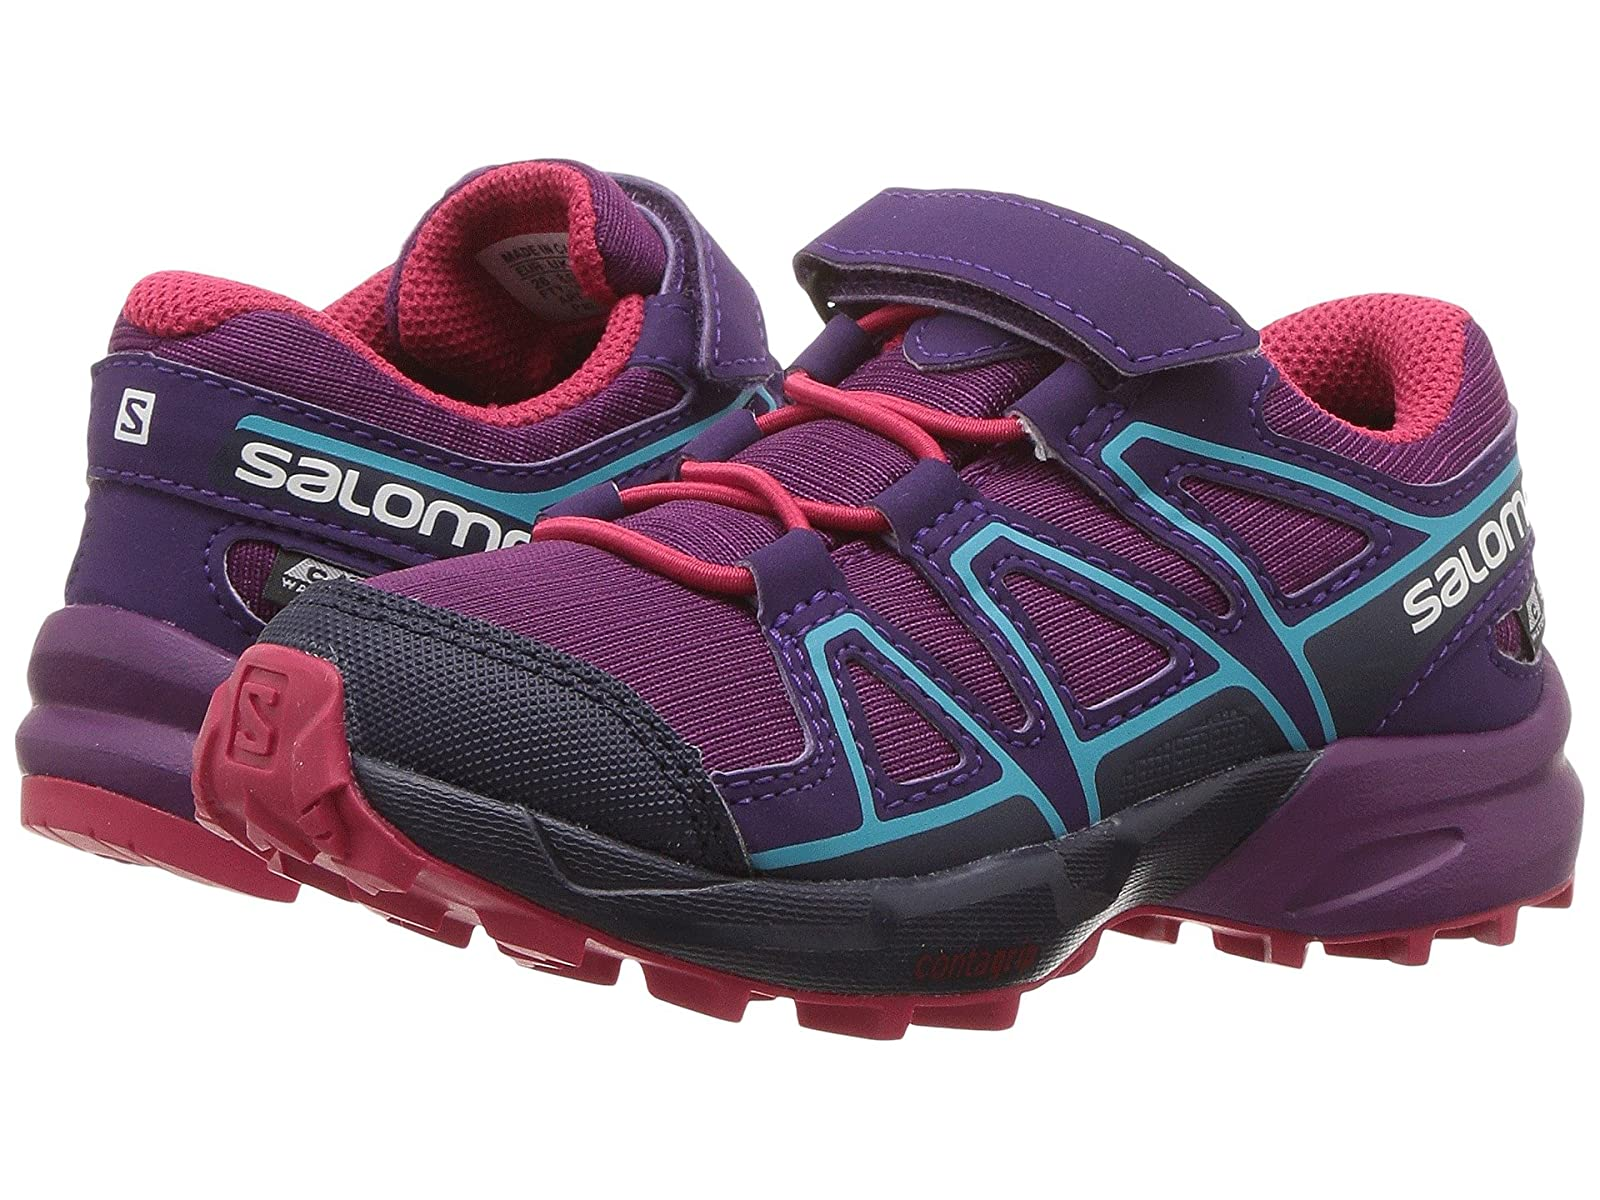 Salomon Kids Speedcross CSWP (Toddler/Little Kid)Atmospheric grades have affordable shoes